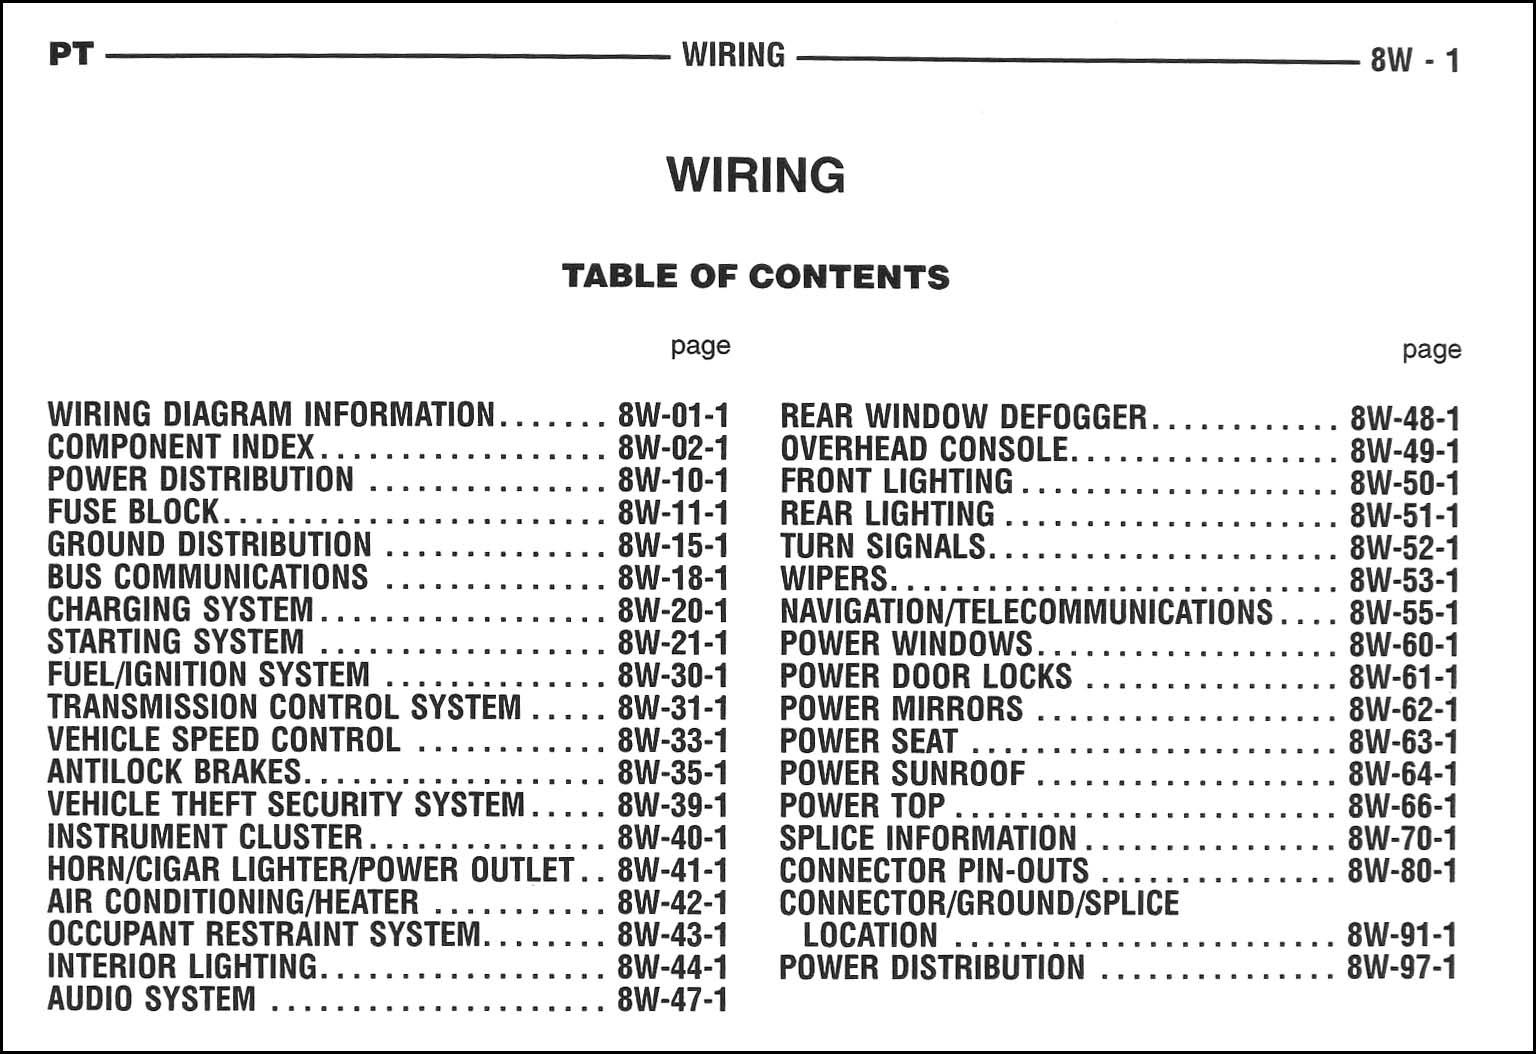 2003 dodge grand caravan radio wiring diagram lv 7749  pt cruiser radio wiring  lv 7749  pt cruiser radio wiring